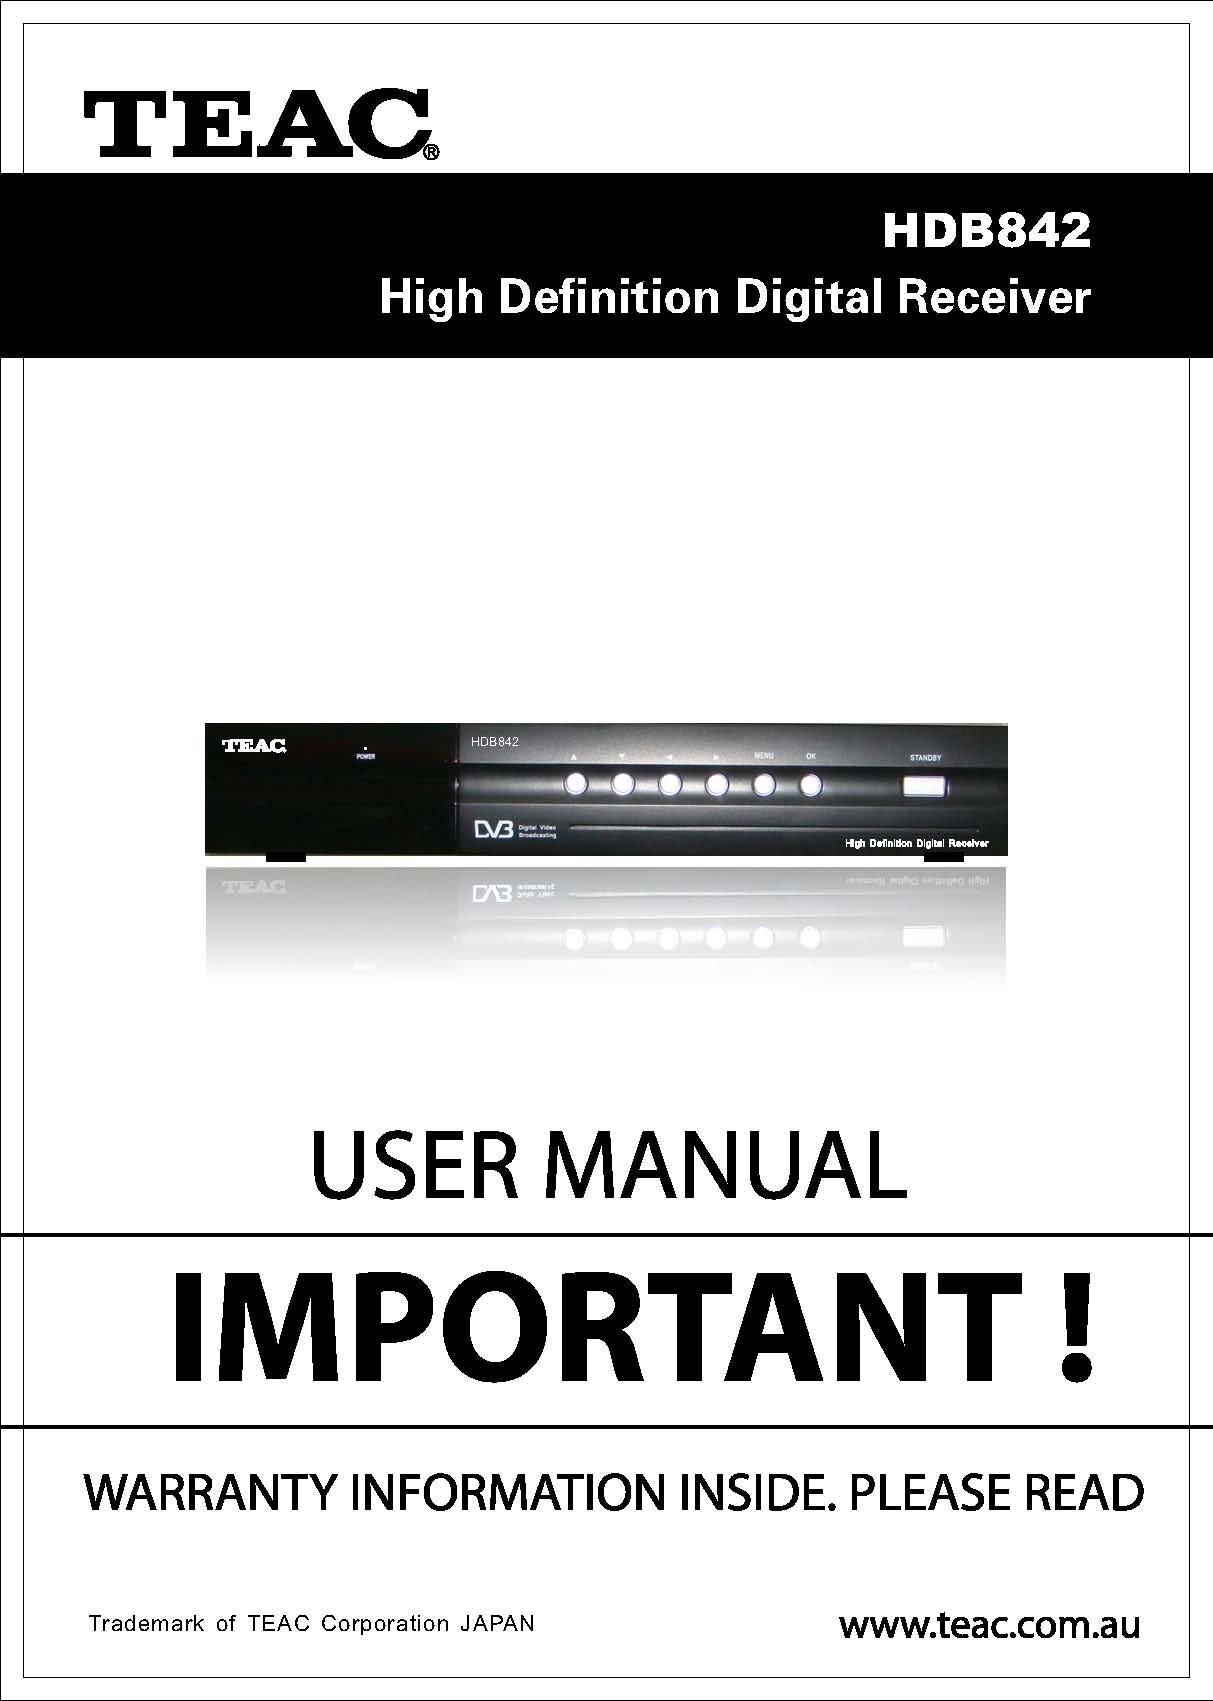 TEAC User Manual